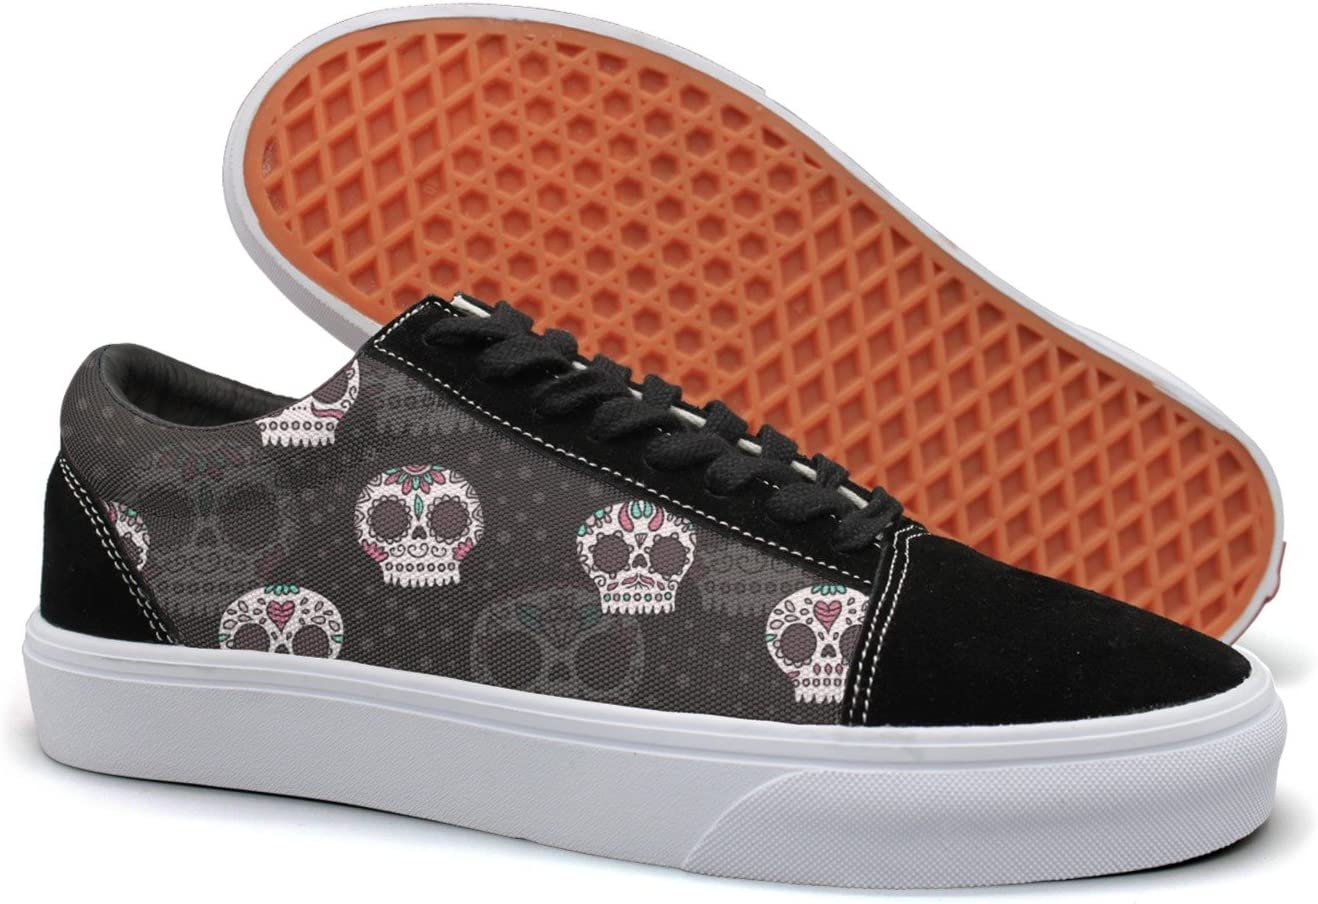 KKLDFD Day Of The Dead Sugar Skull Online 2018 Mens Retro Sneakers